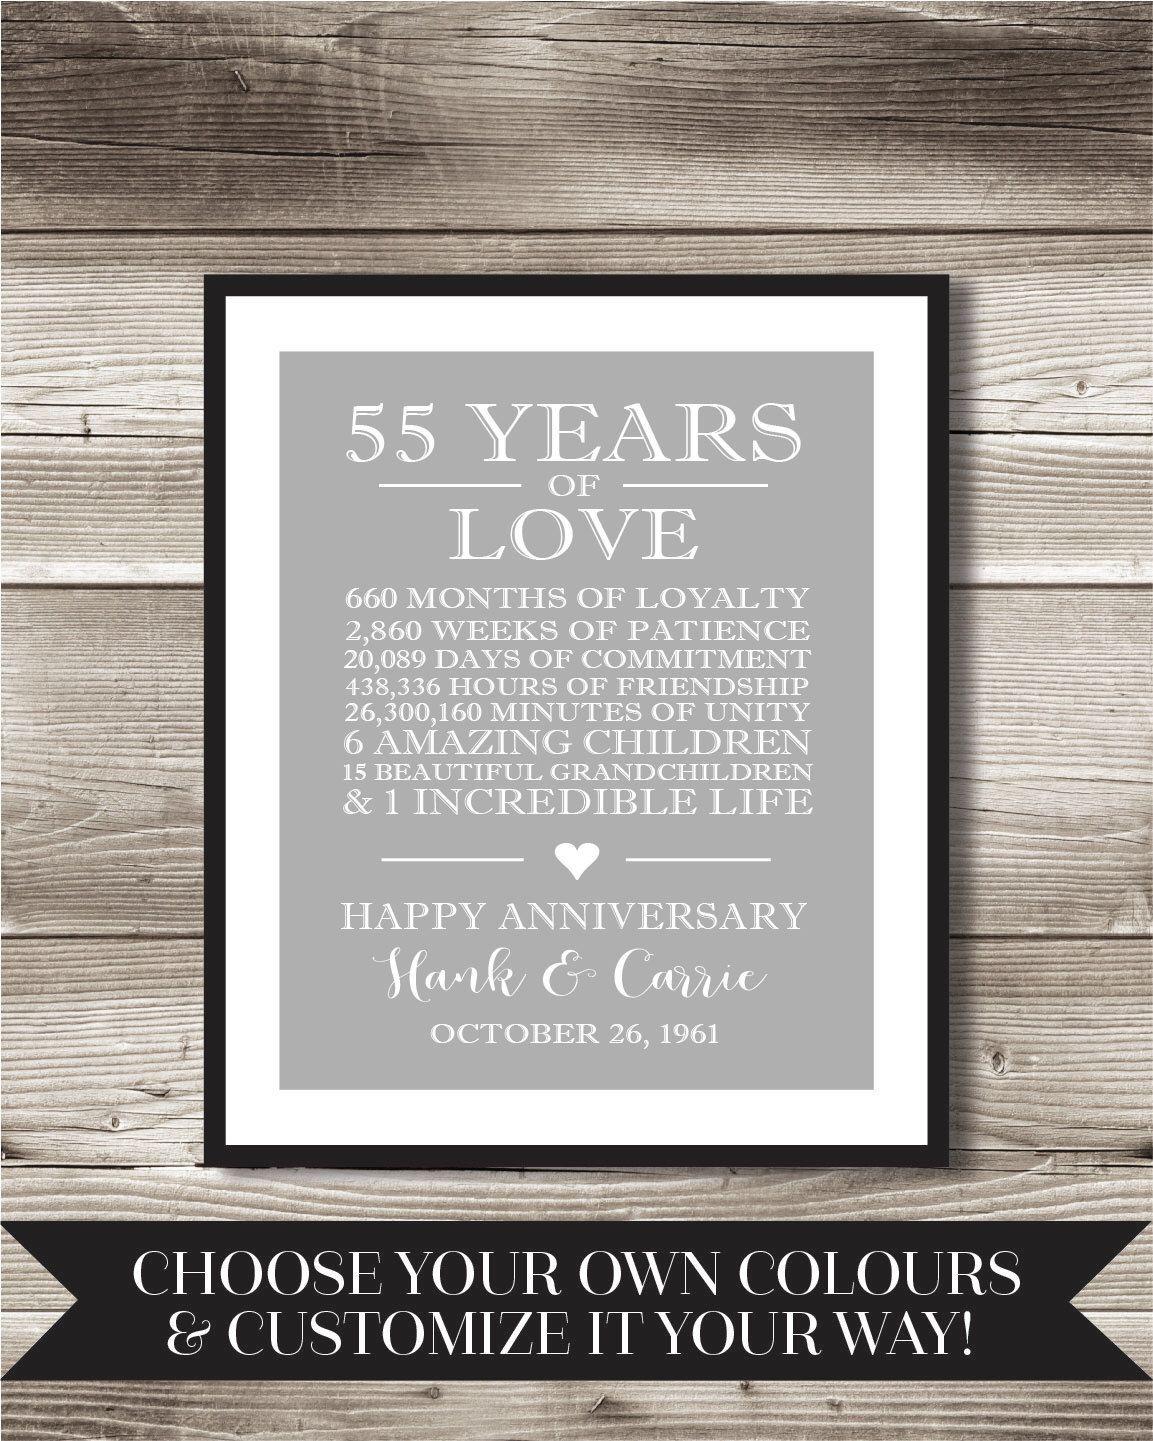 55 Years of Love; Anniversary Digital Print; Choose your